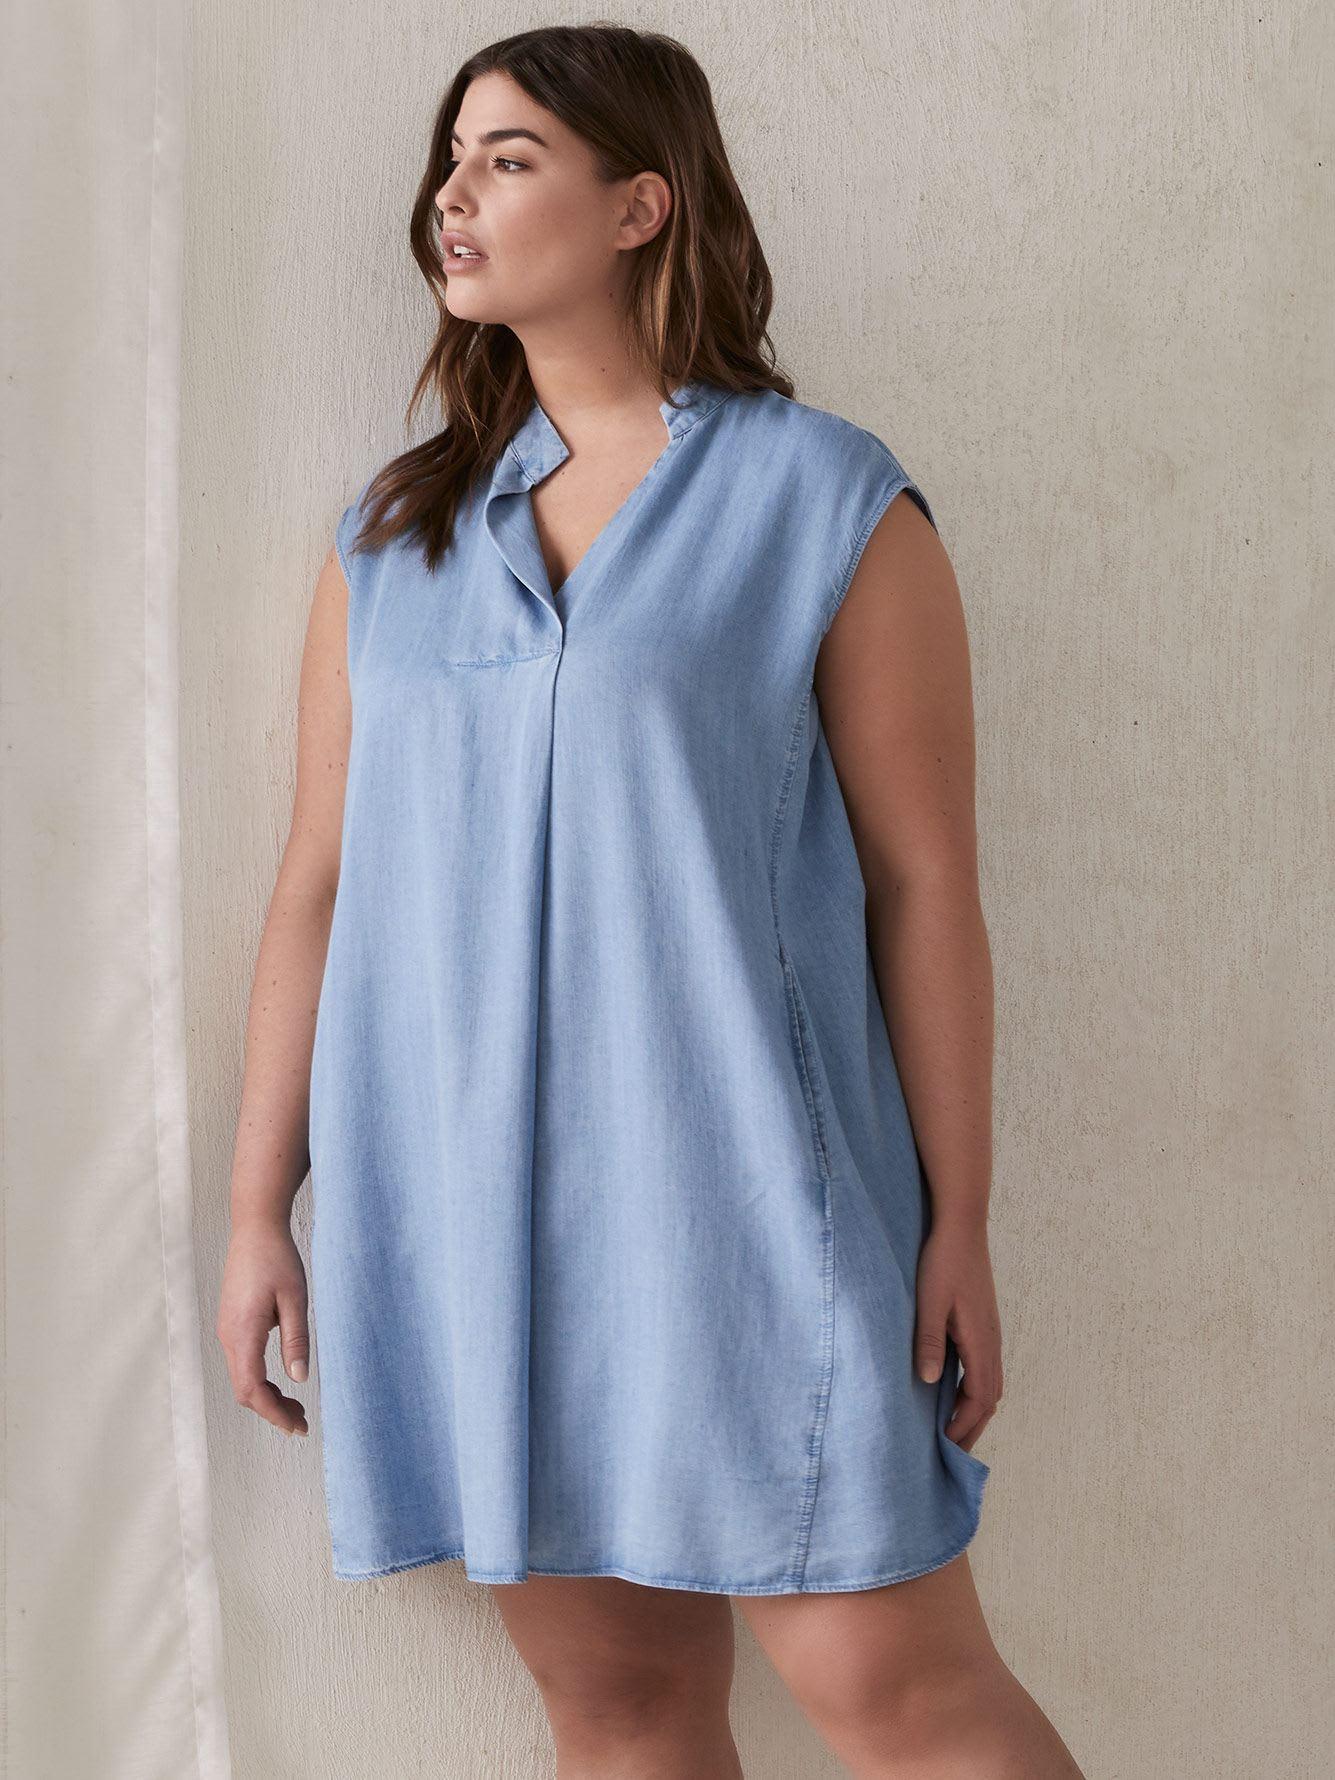 08472ac64 Chambray Harper Dress - RACHEL Rachel Roy | Addition Elle